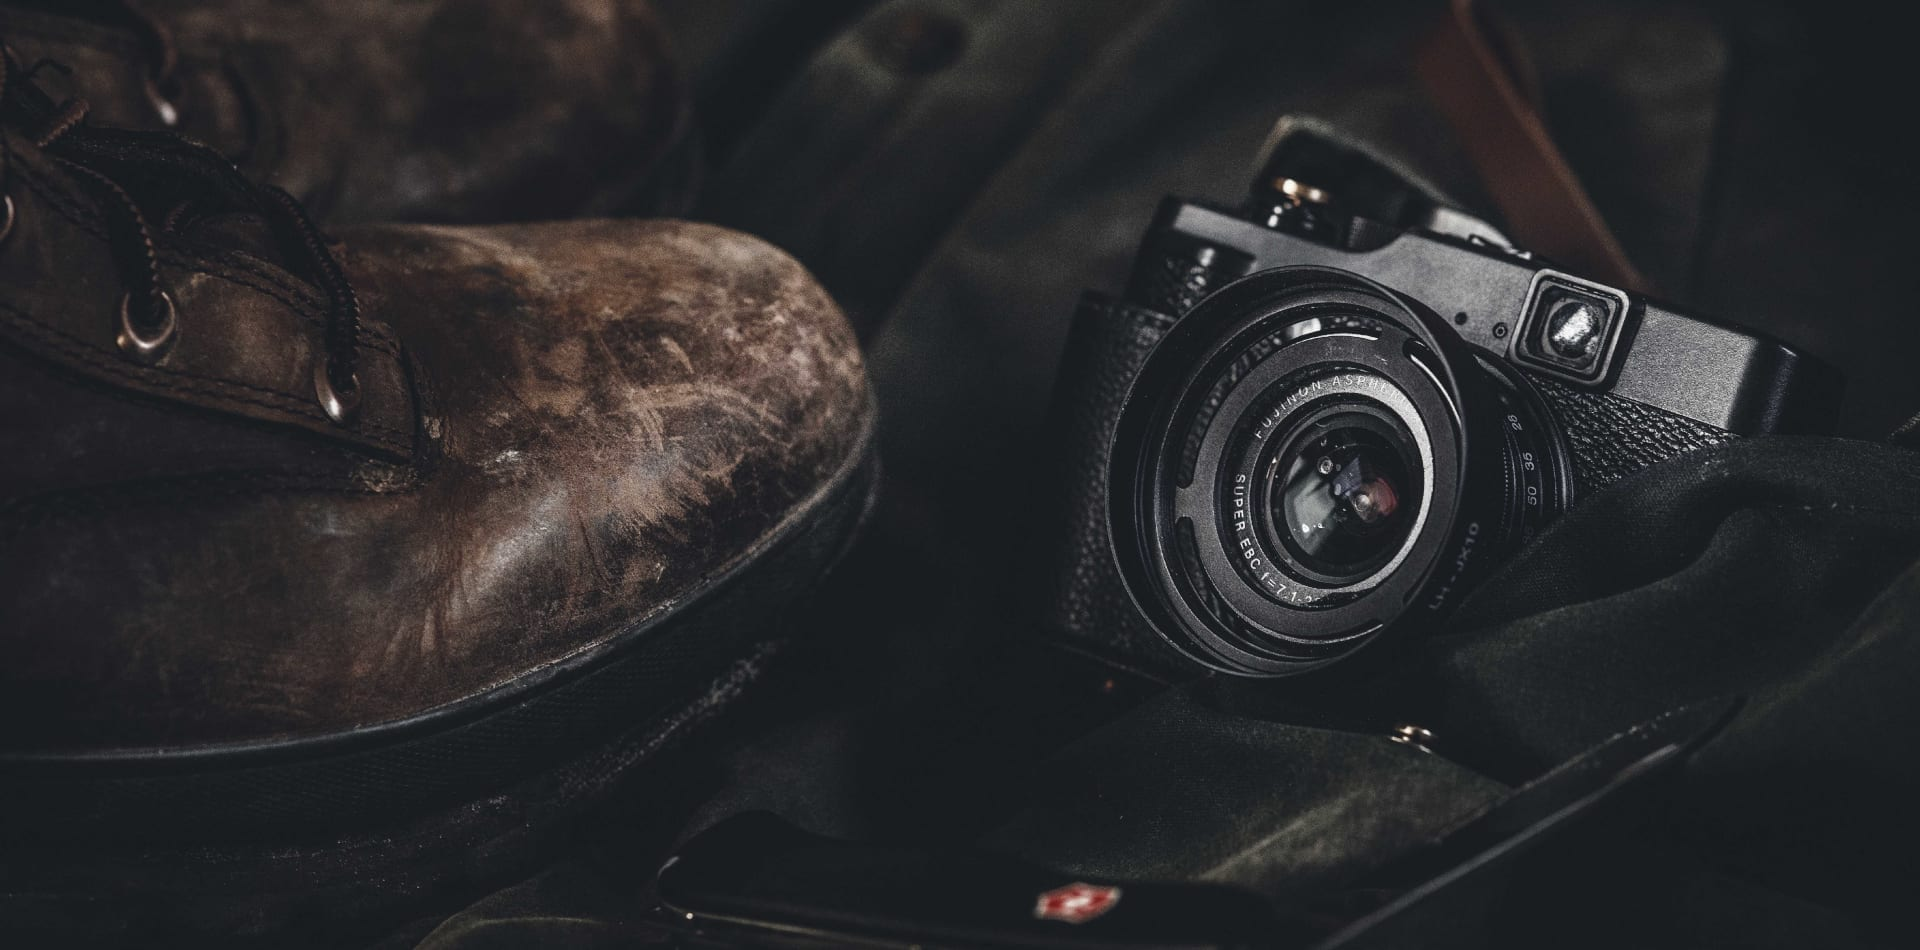 High-tech camera